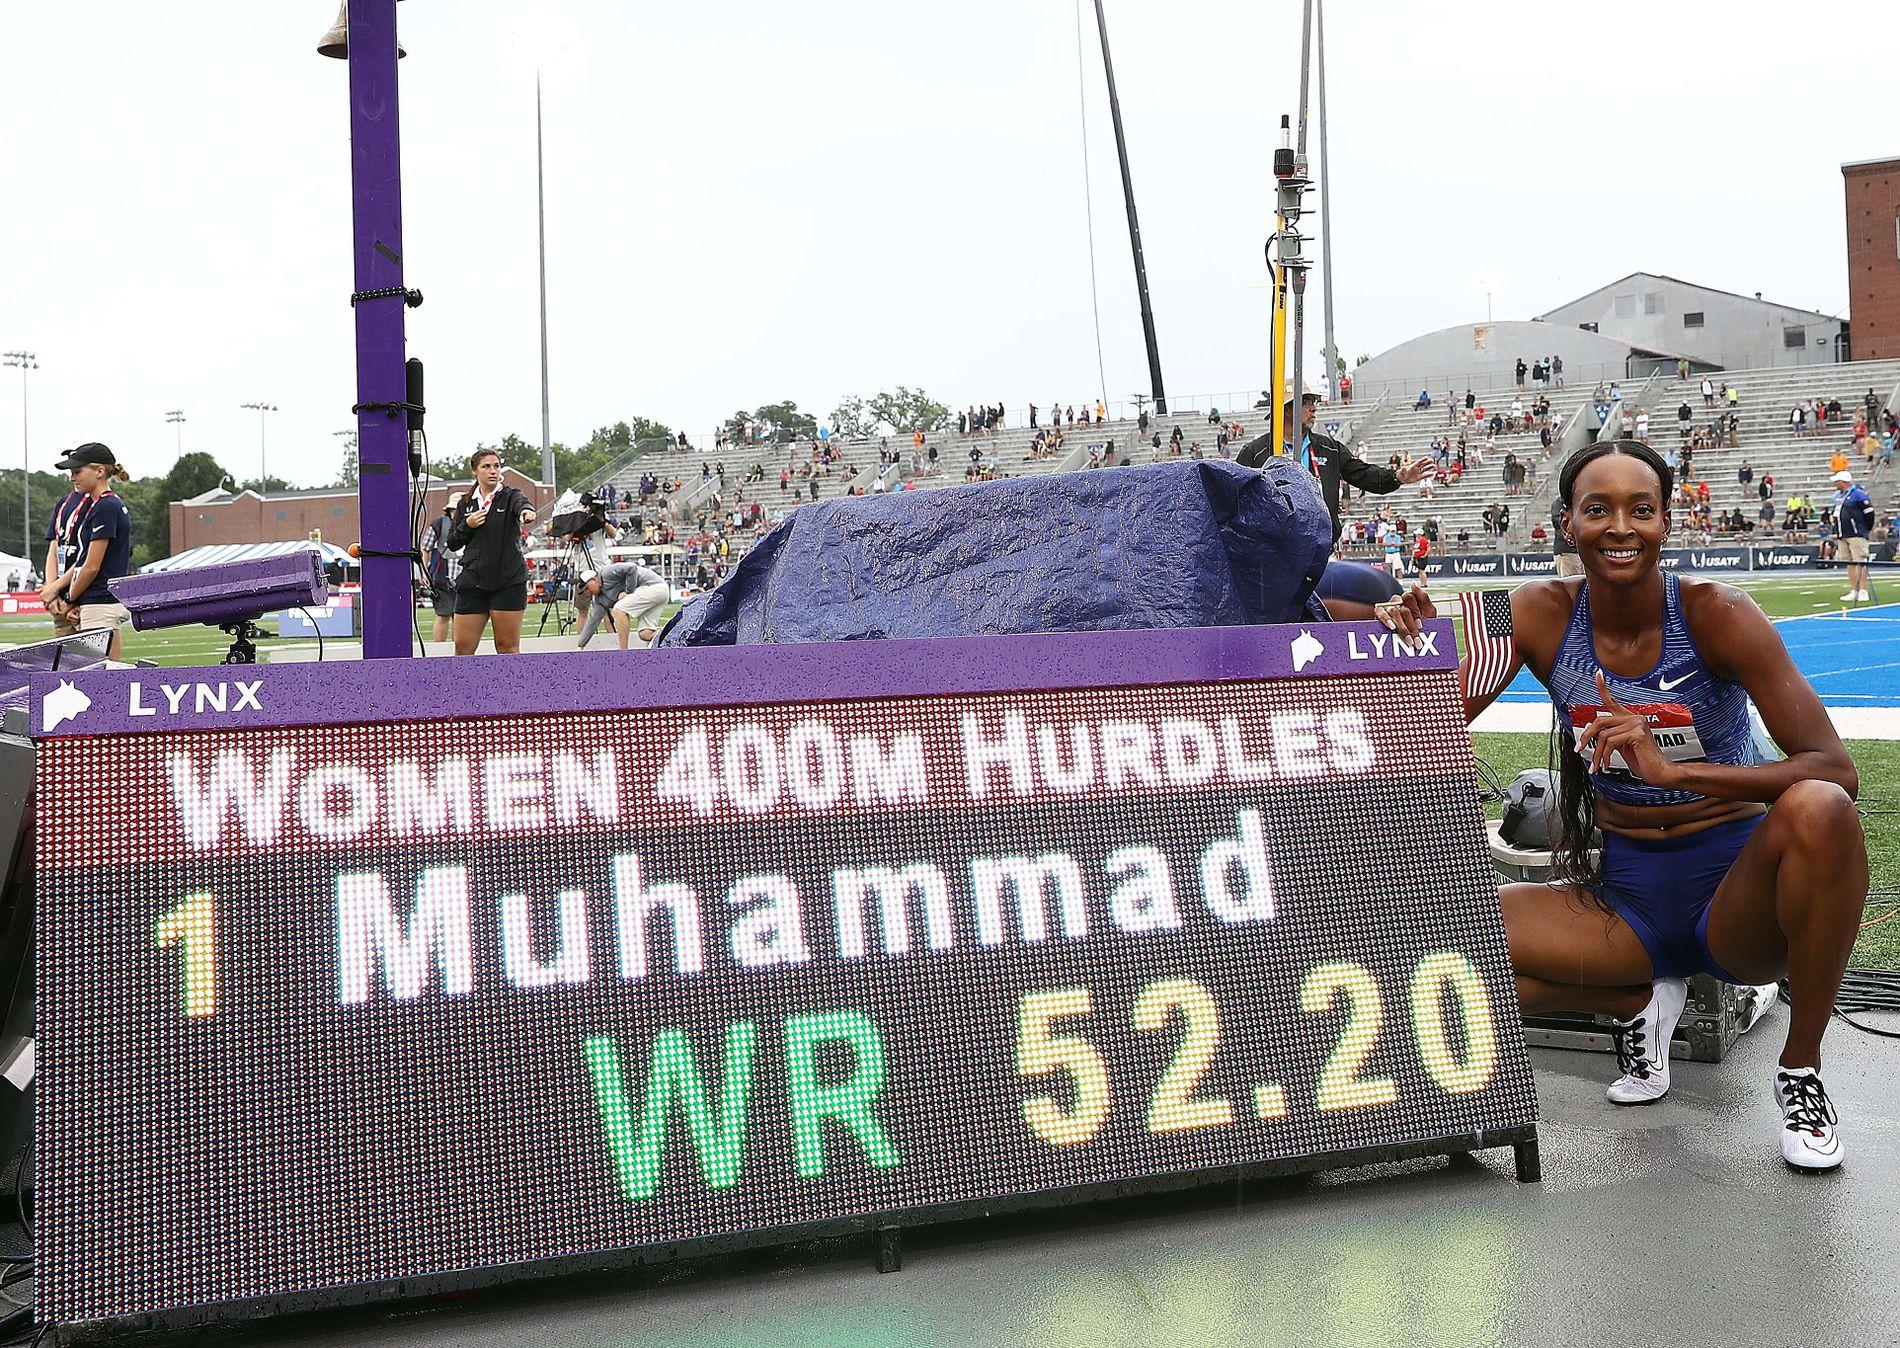 REKORD-GLAD: Dalilah Muhammad (29) satte verdensrekord på 400 meter hekk i Iowa 27. juli.